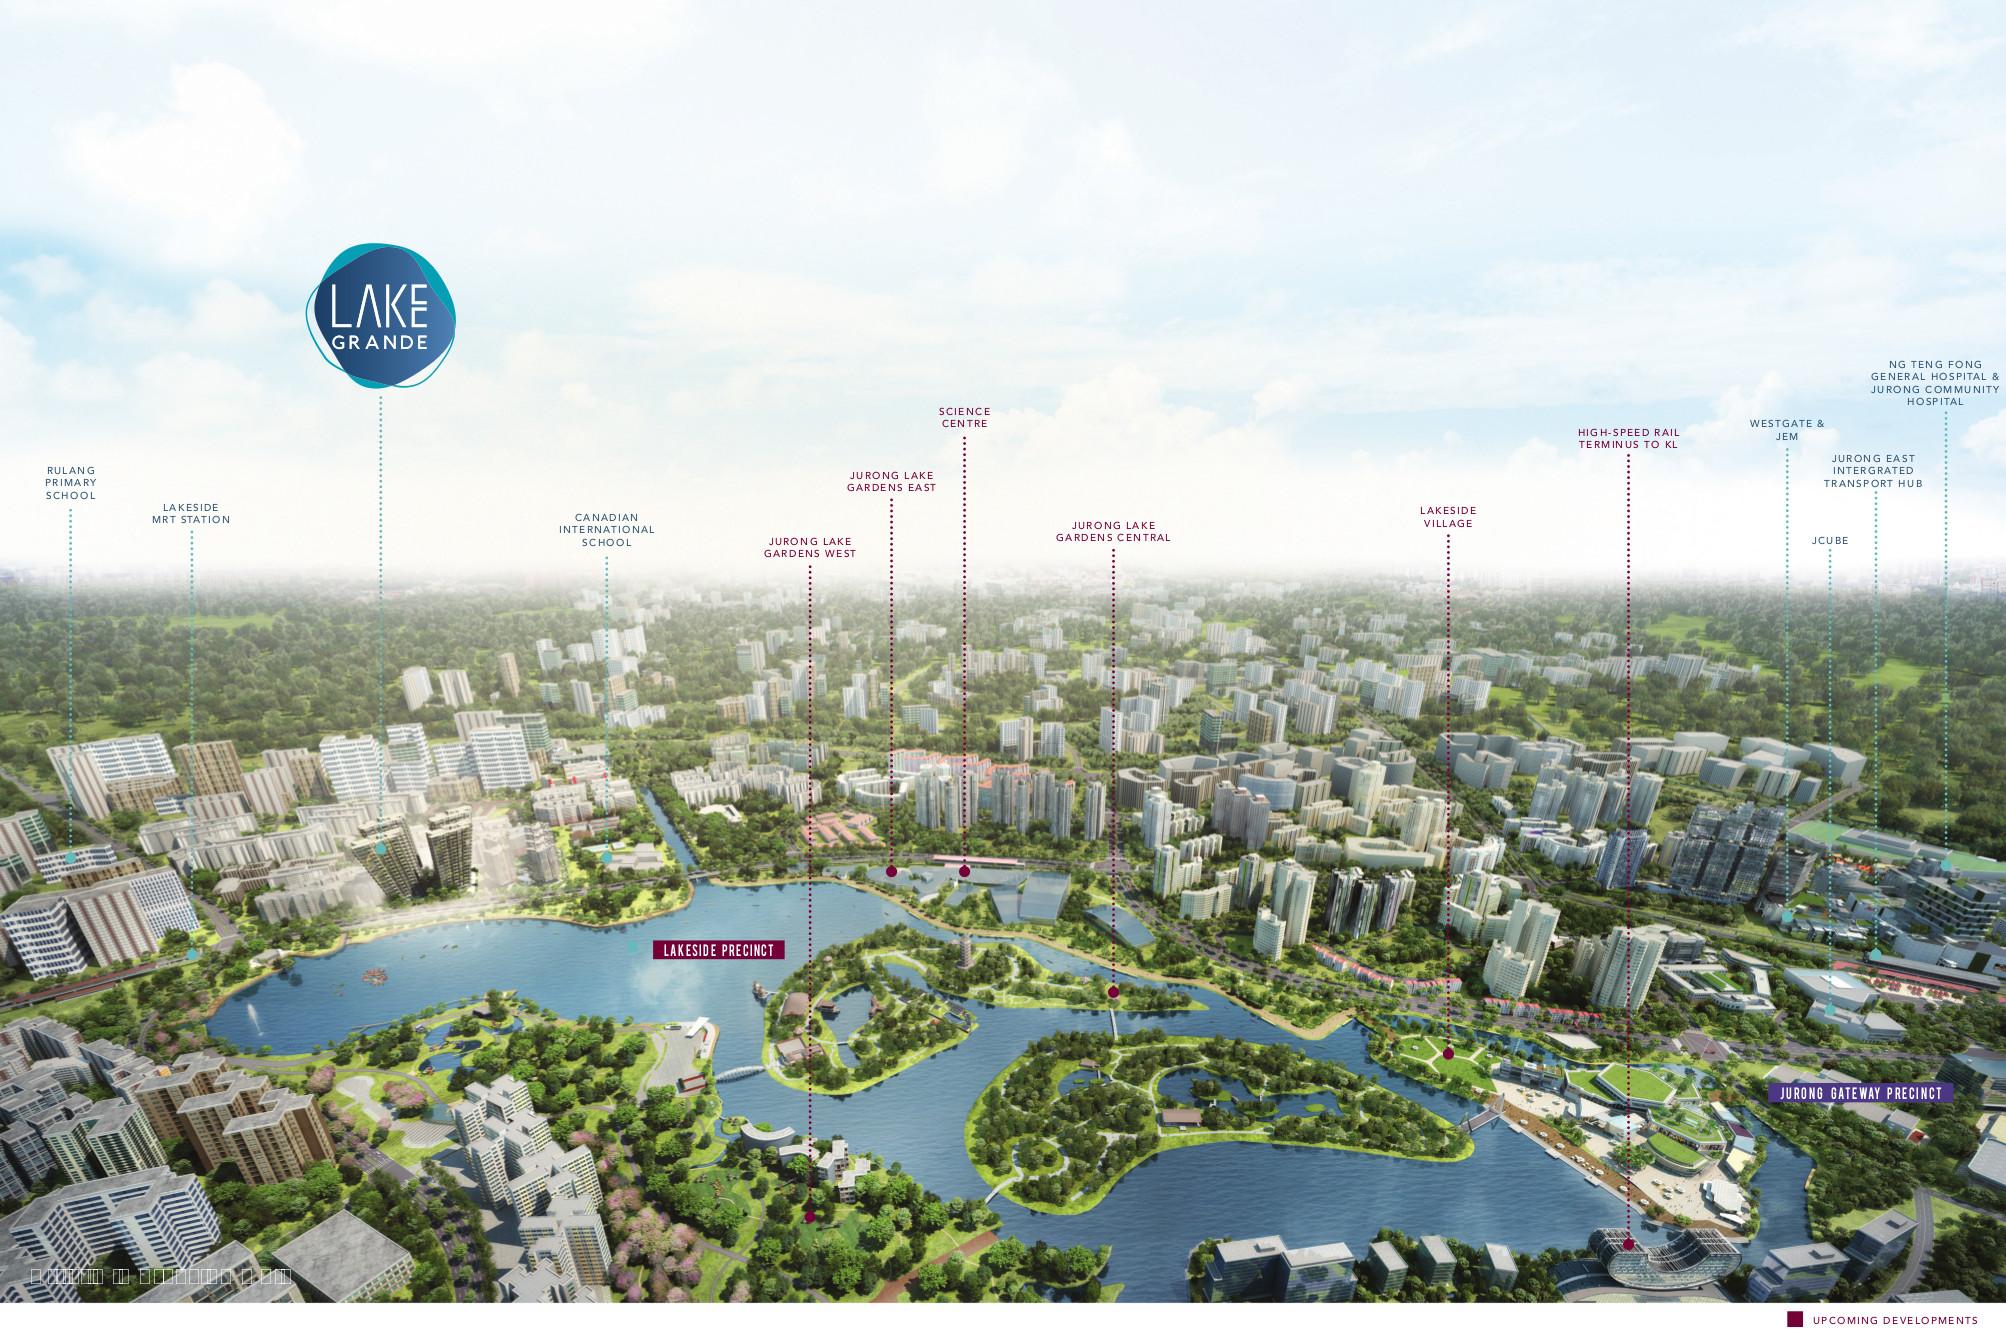 Lake Grande Location in Jurong Masterplan Growth Area